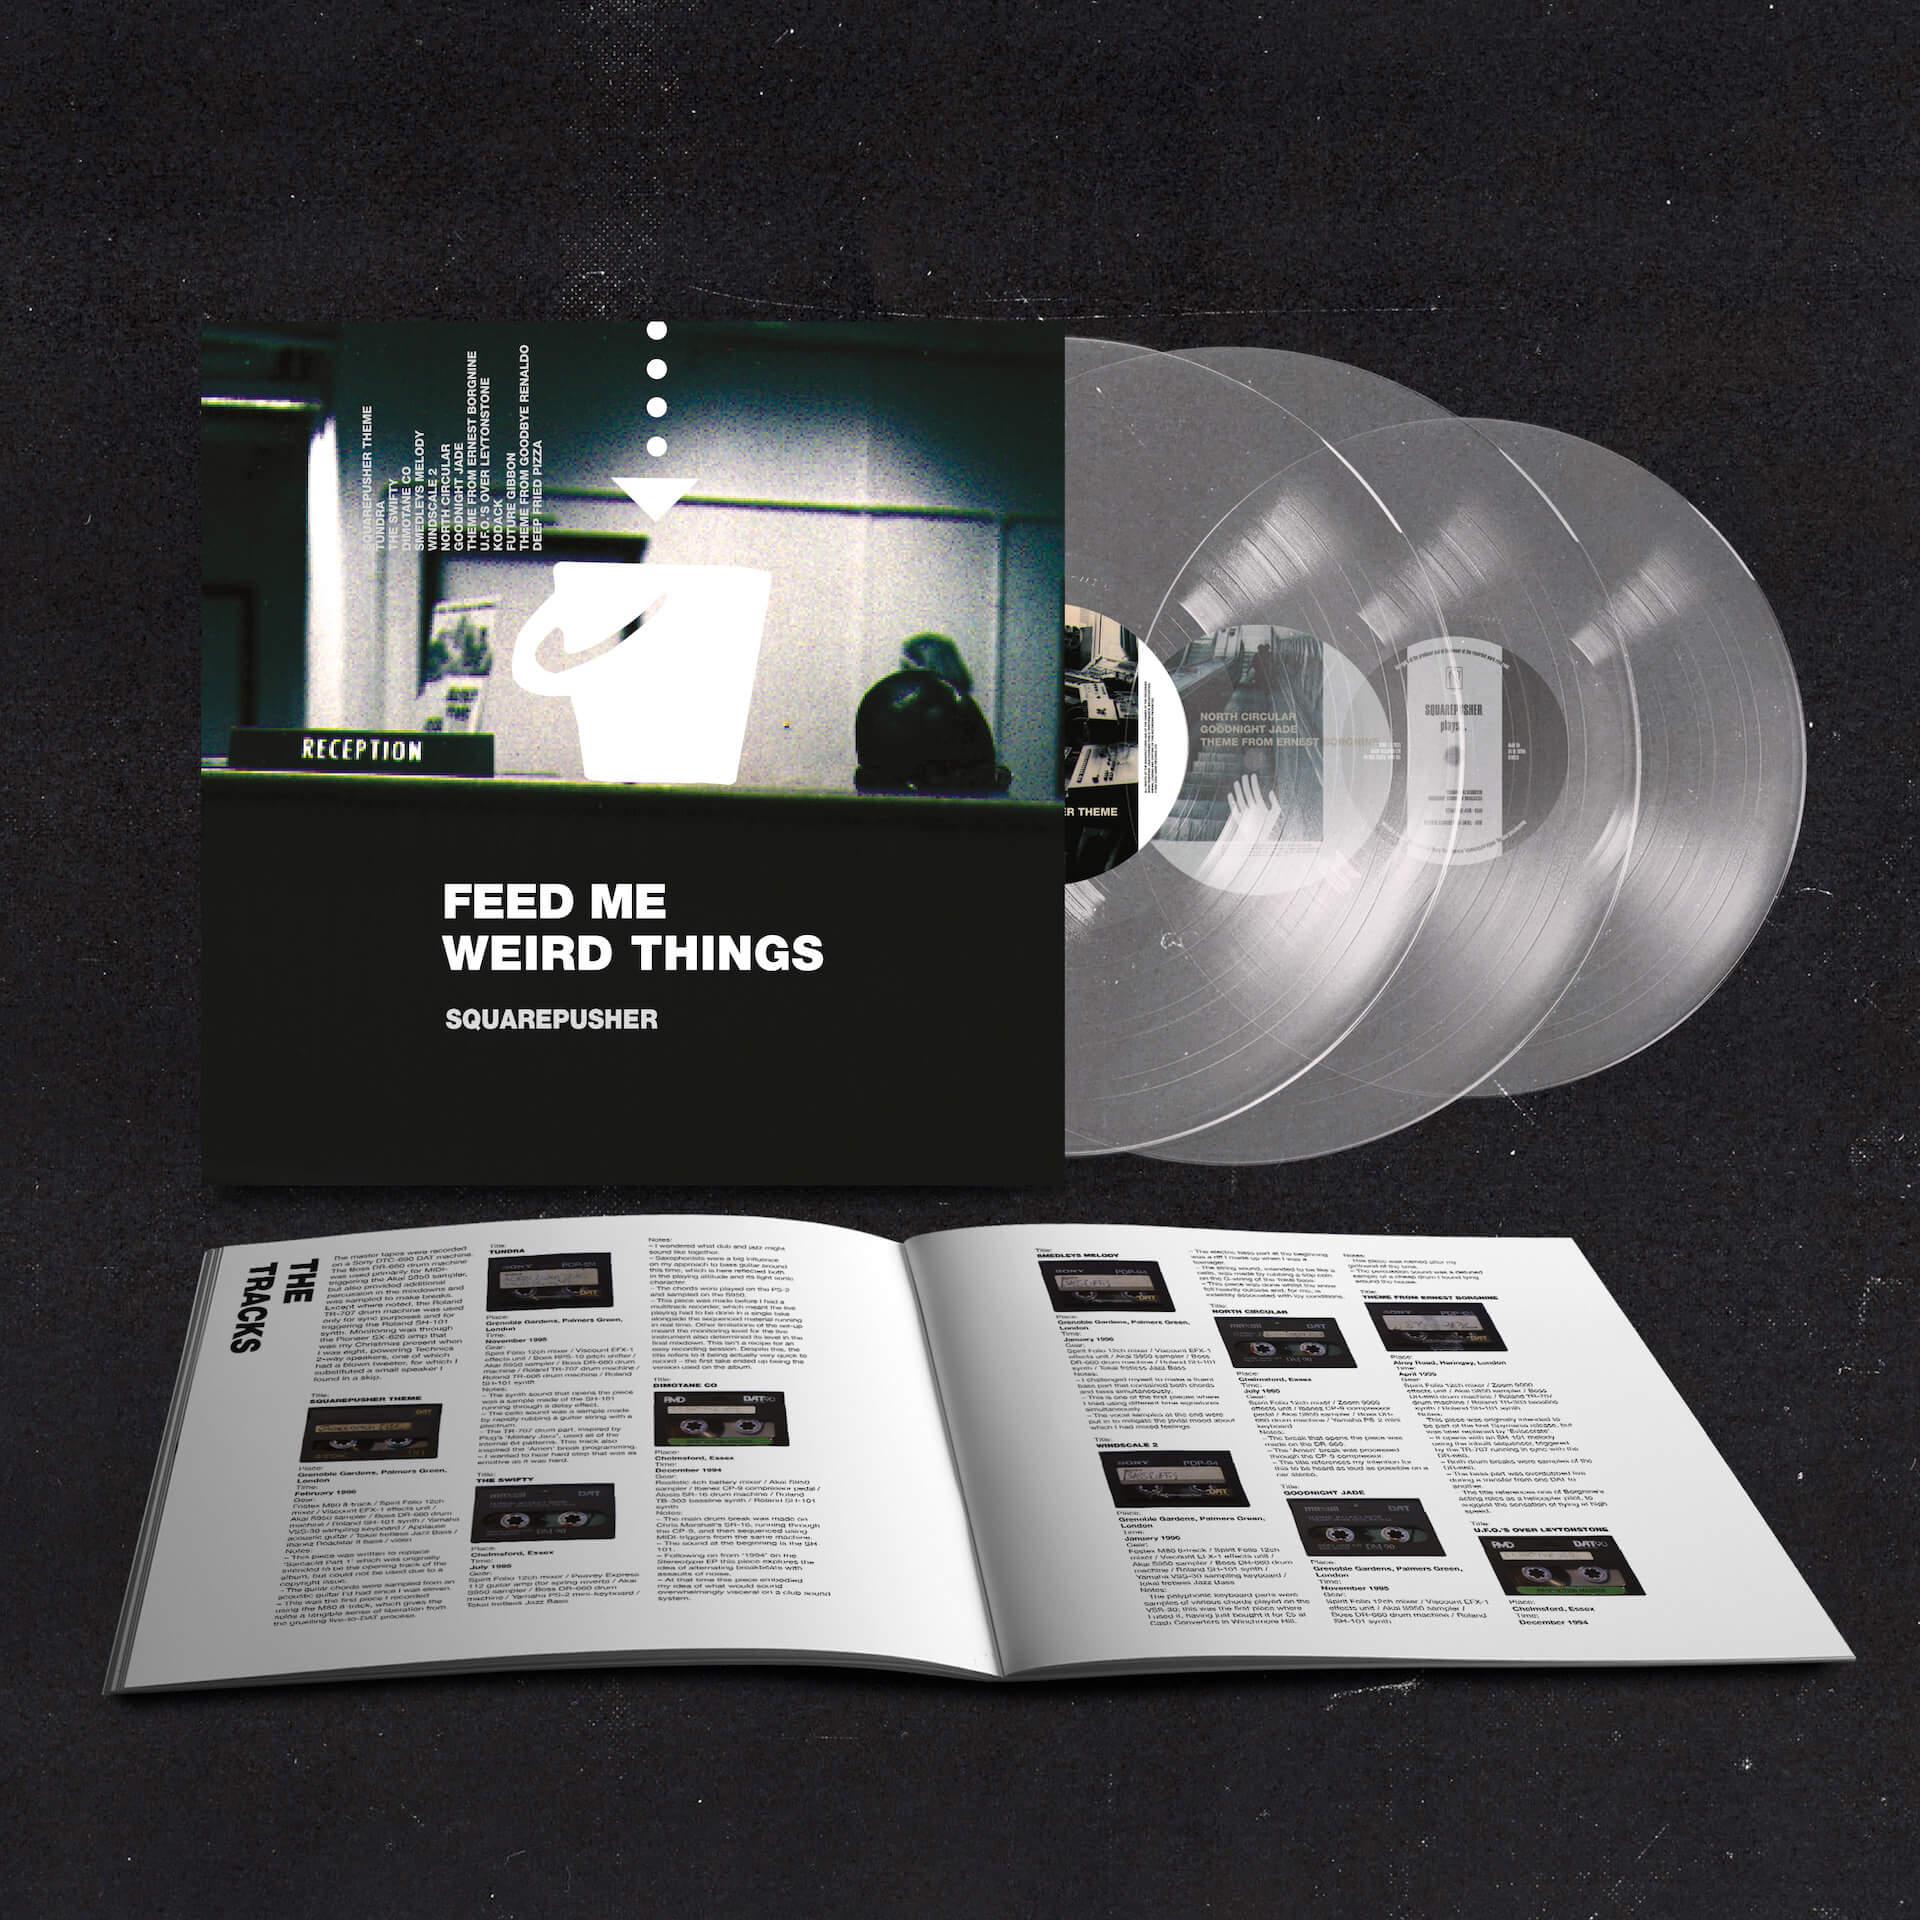 Squarepusherデビューアルバム『Feed Me Weird Things』再発盤が本日ついに発売!待望のサブスクも解禁 music210604_squarepusher_4